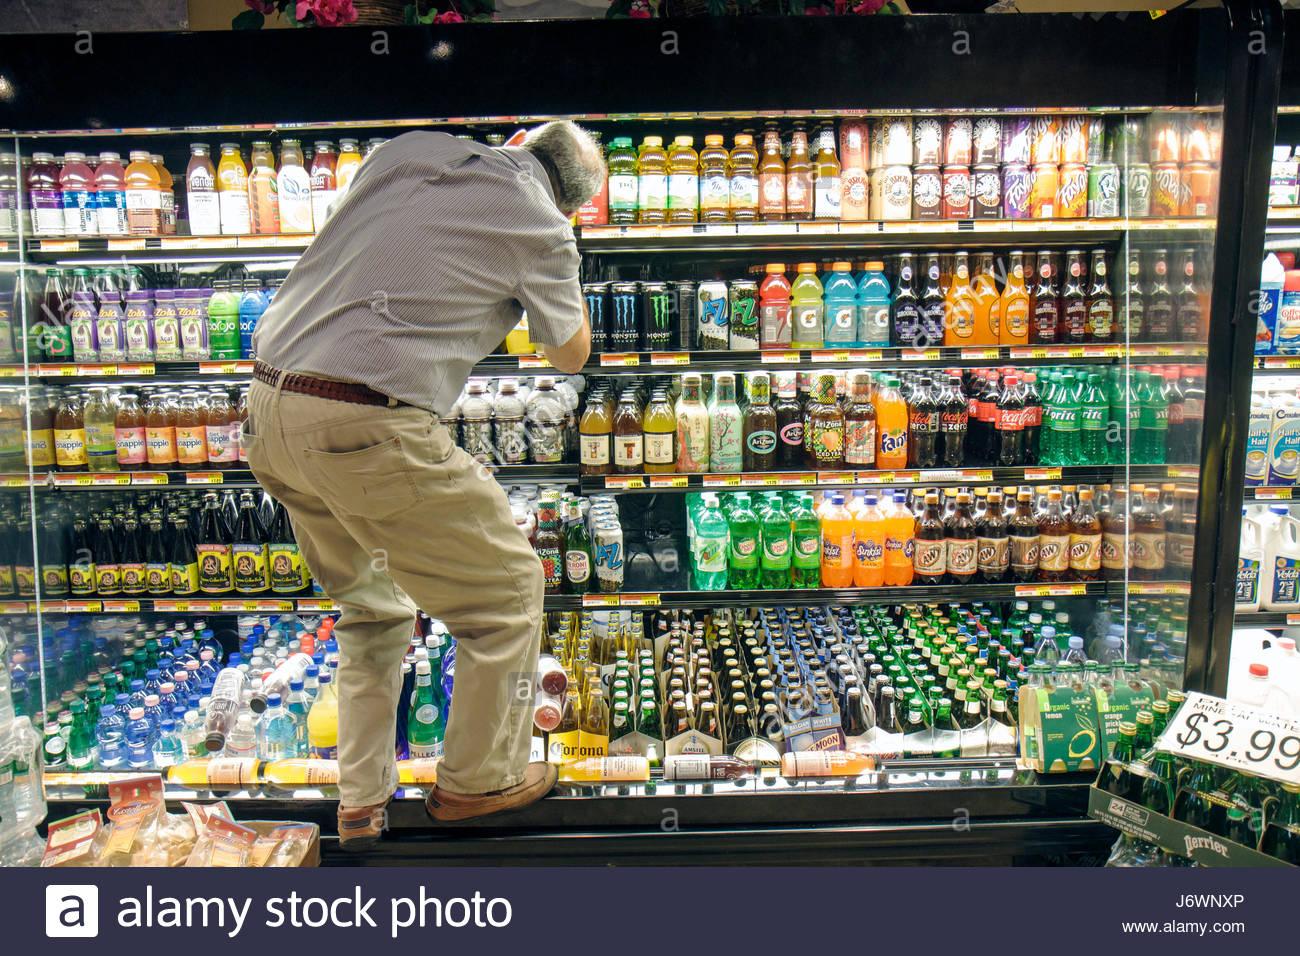 Boca Raton Florida Les magasins à Boca Center homme vitrine réfrigérée pour  boissons shopping Photo Stock df7a217e04e0